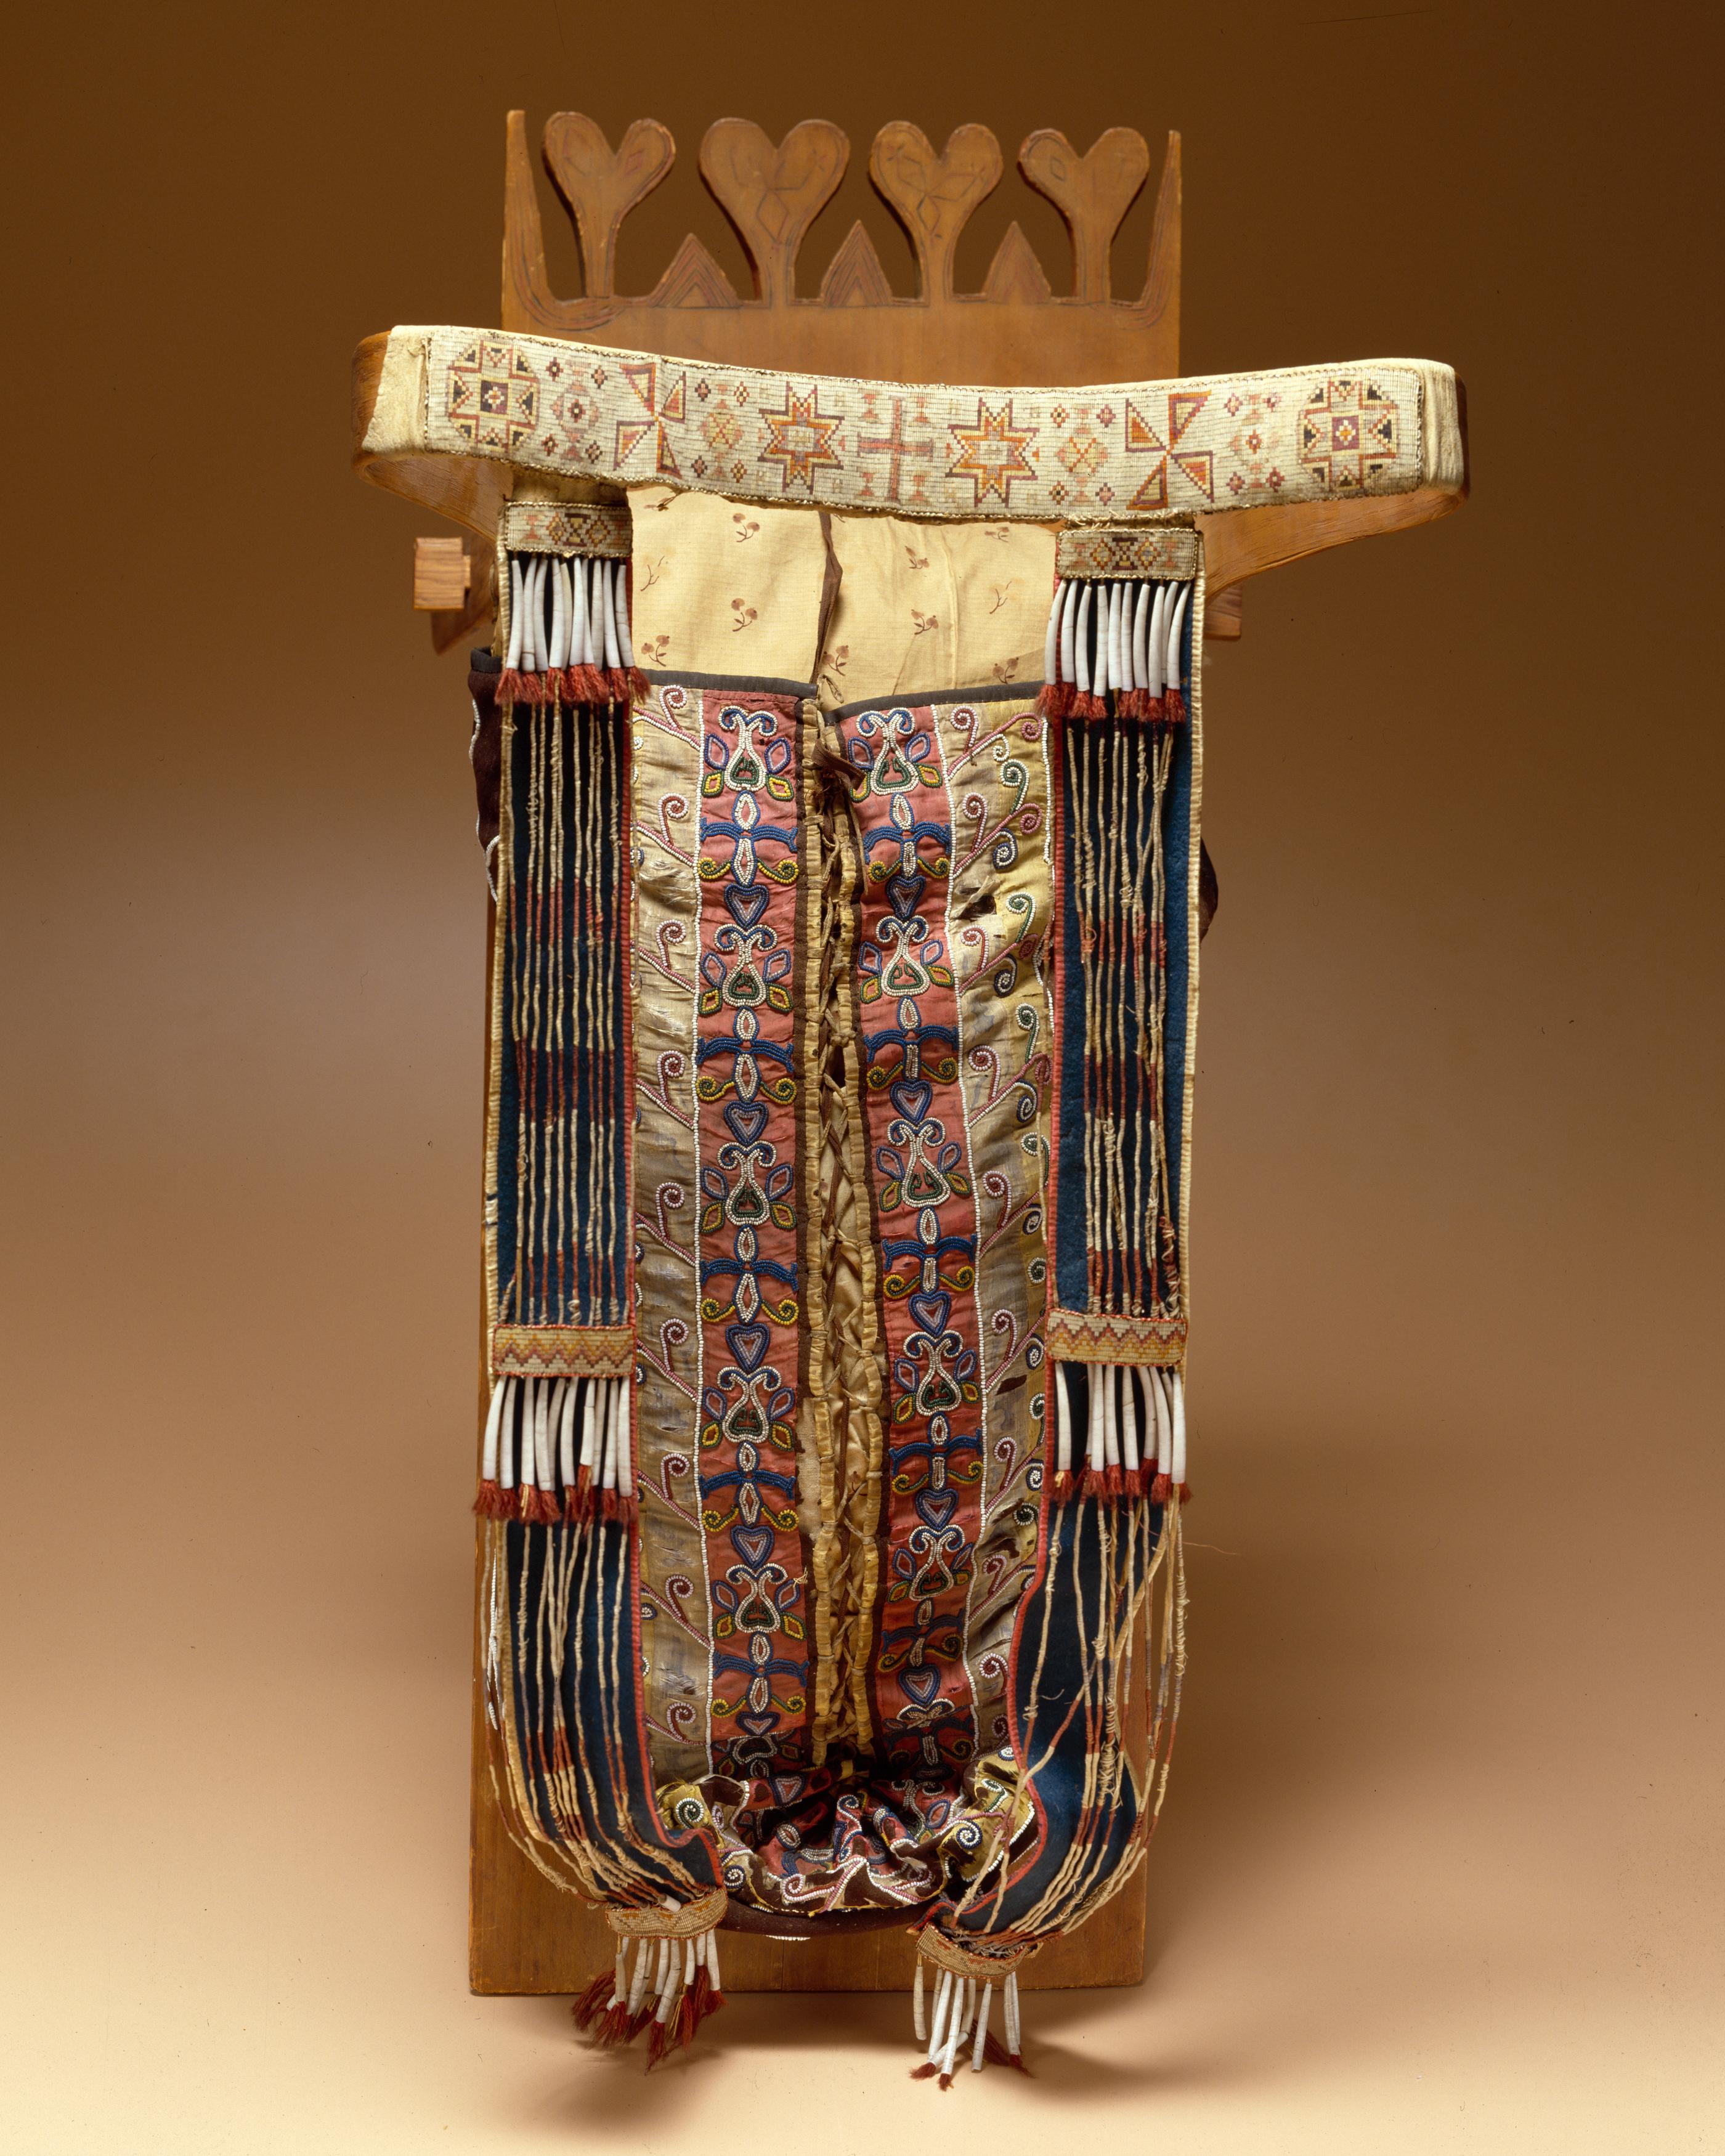 US warns Newton seminary over native artifacts - The Boston